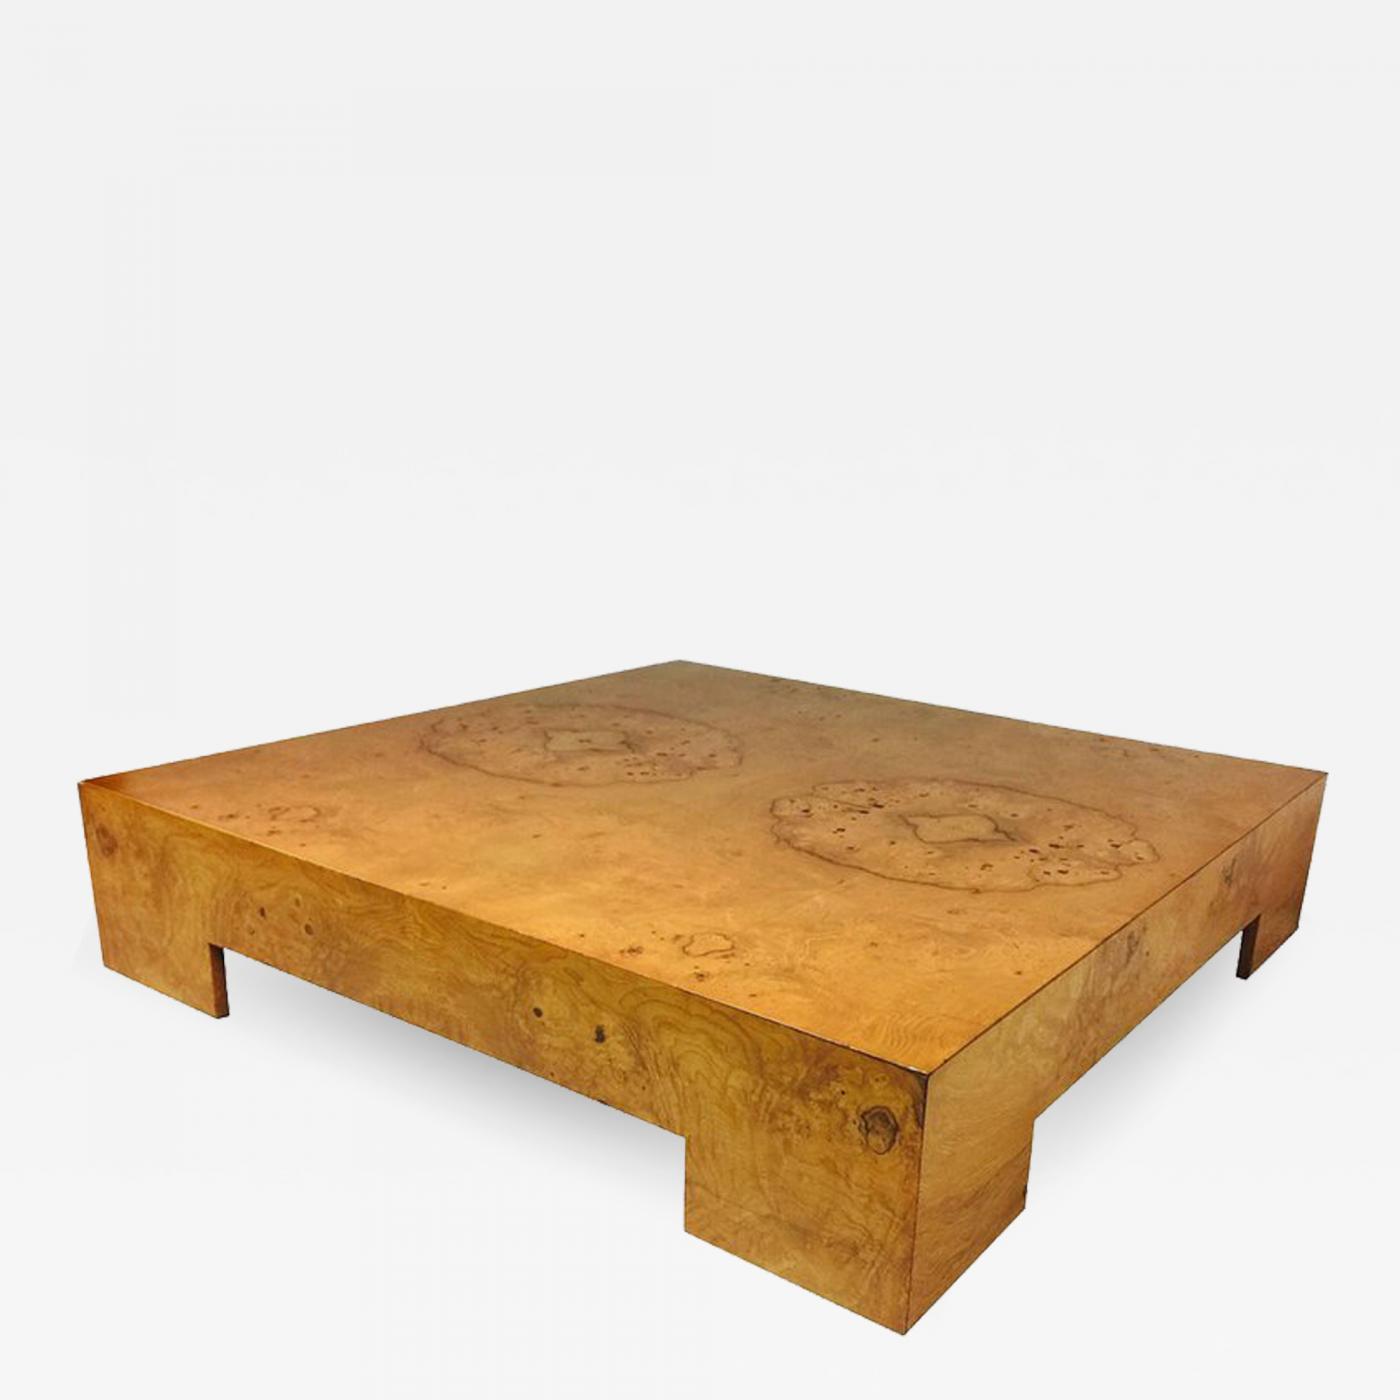 Milo Baughman Milo Baughman Burl Wood Coffee Table in size 1400 X 1400